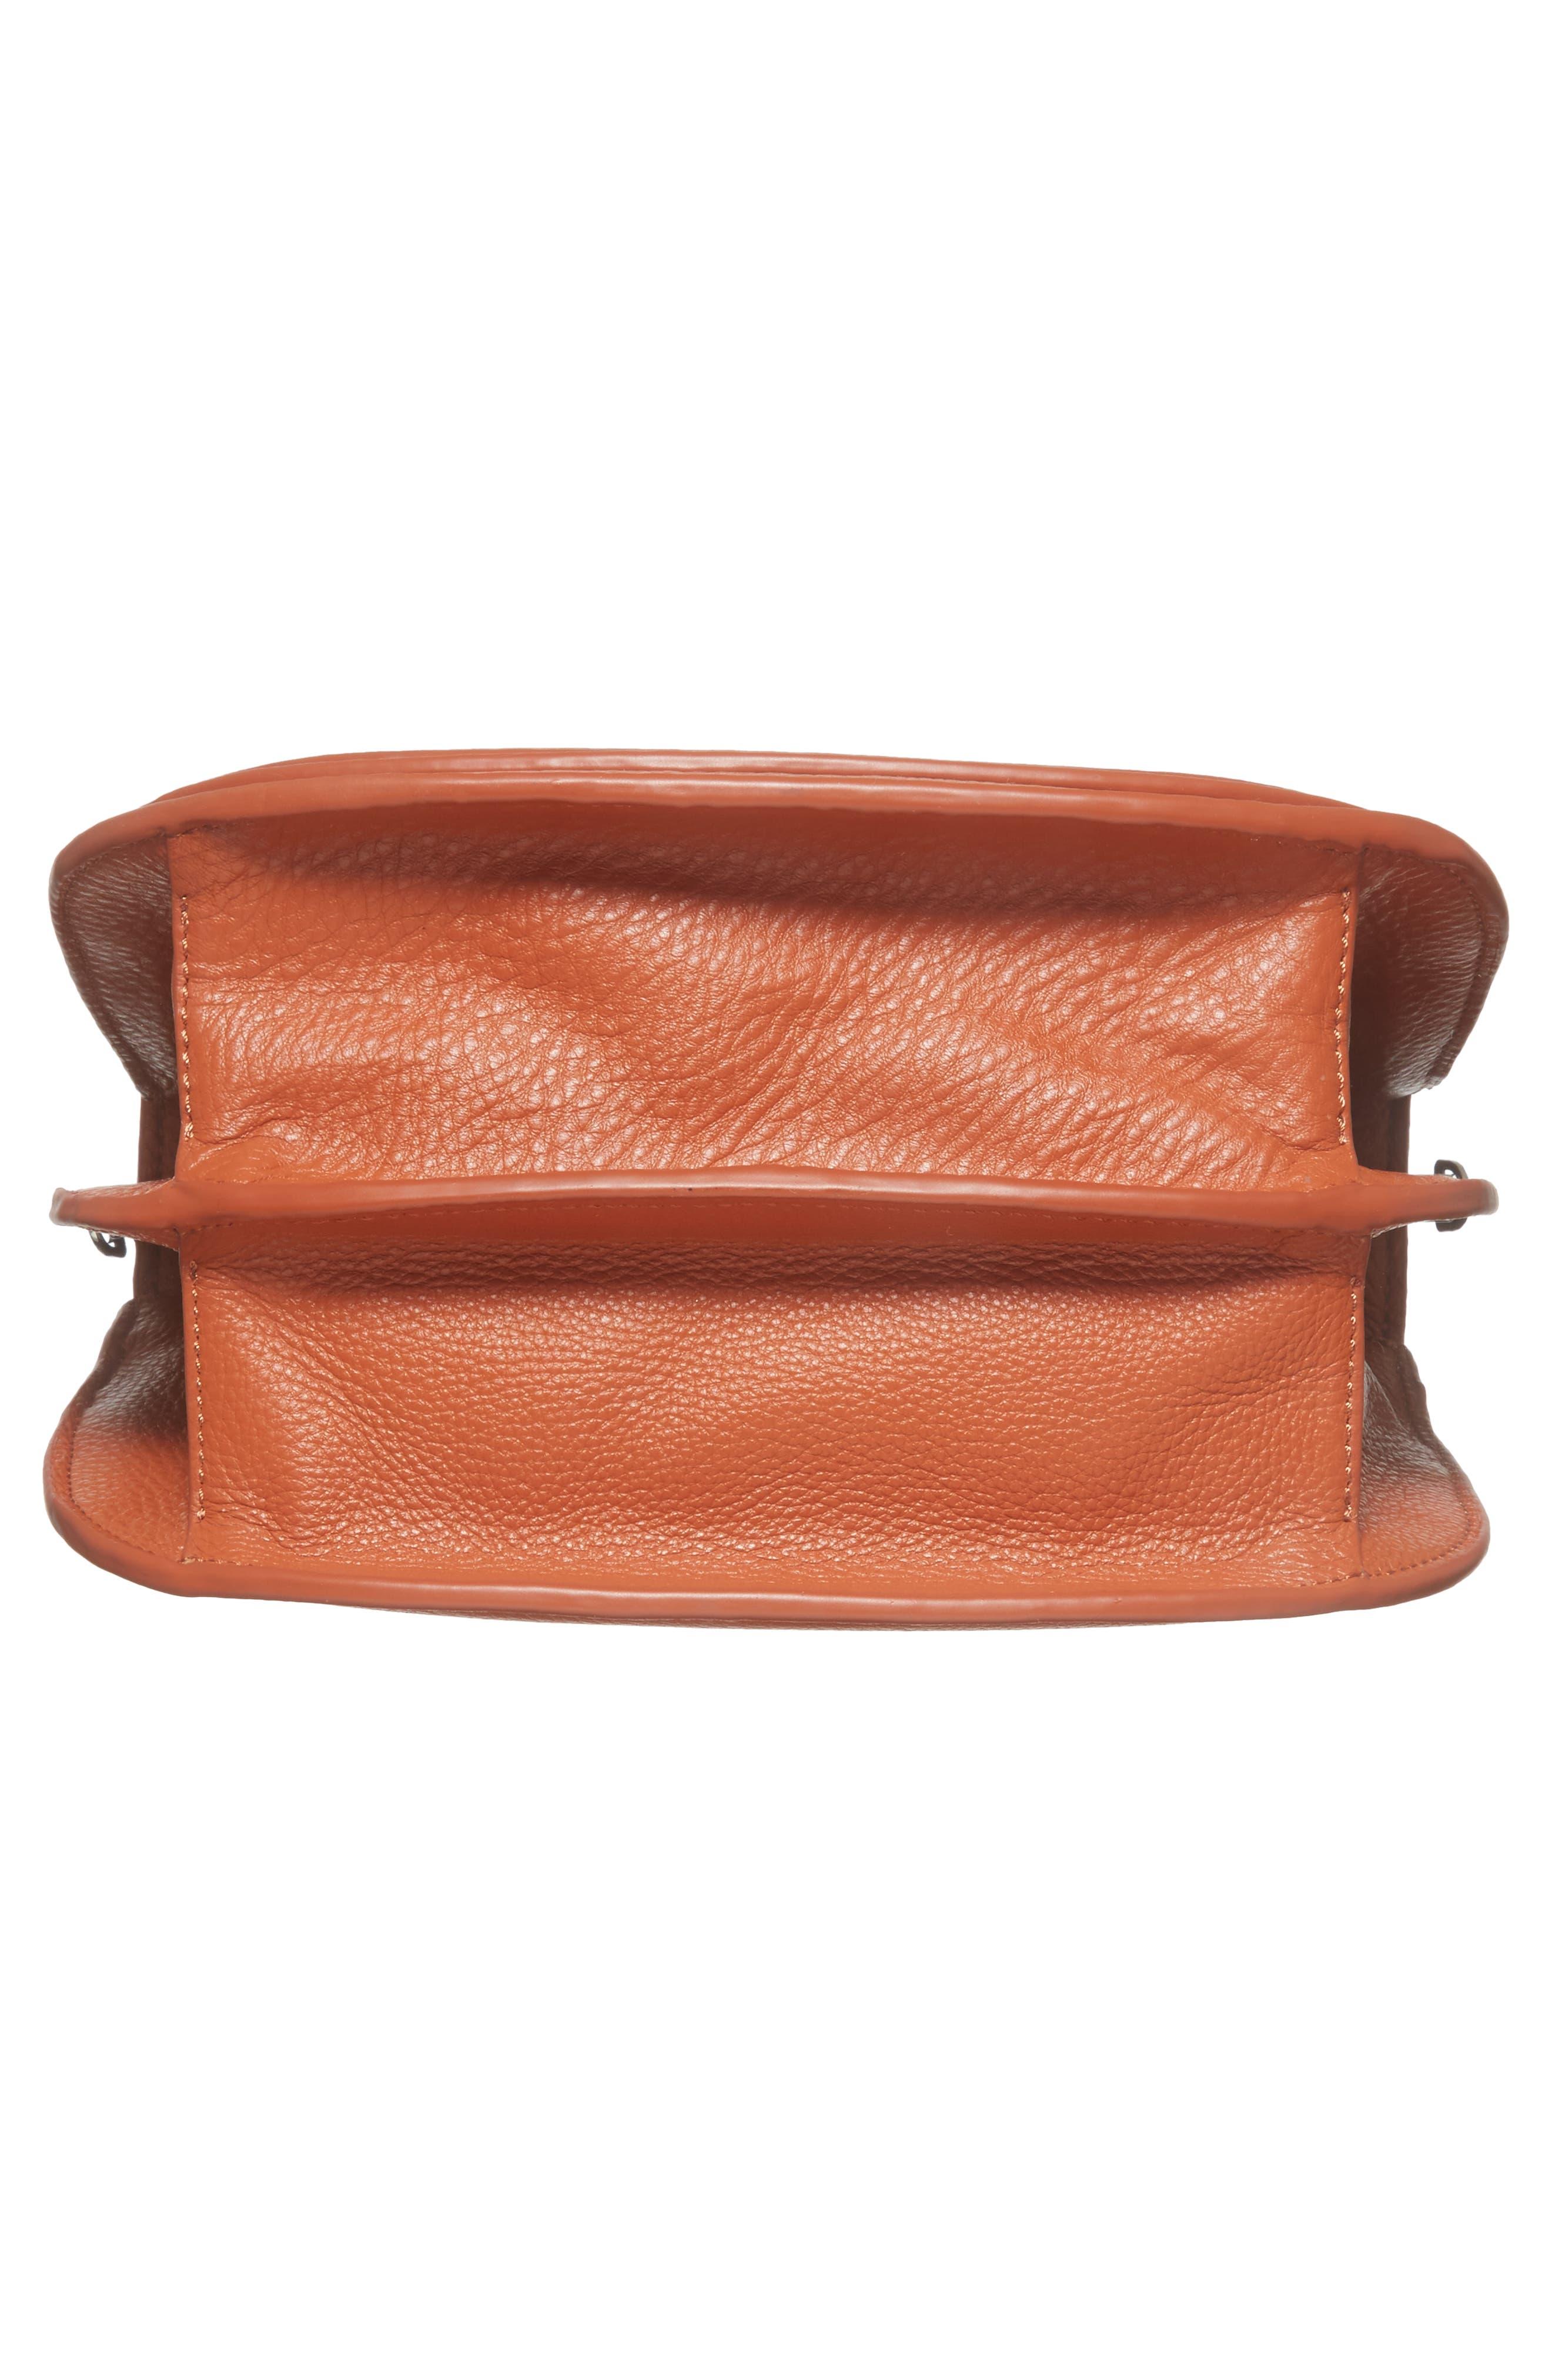 Landon Leather Crossbody Saddle Bag,                             Alternate thumbnail 24, color,